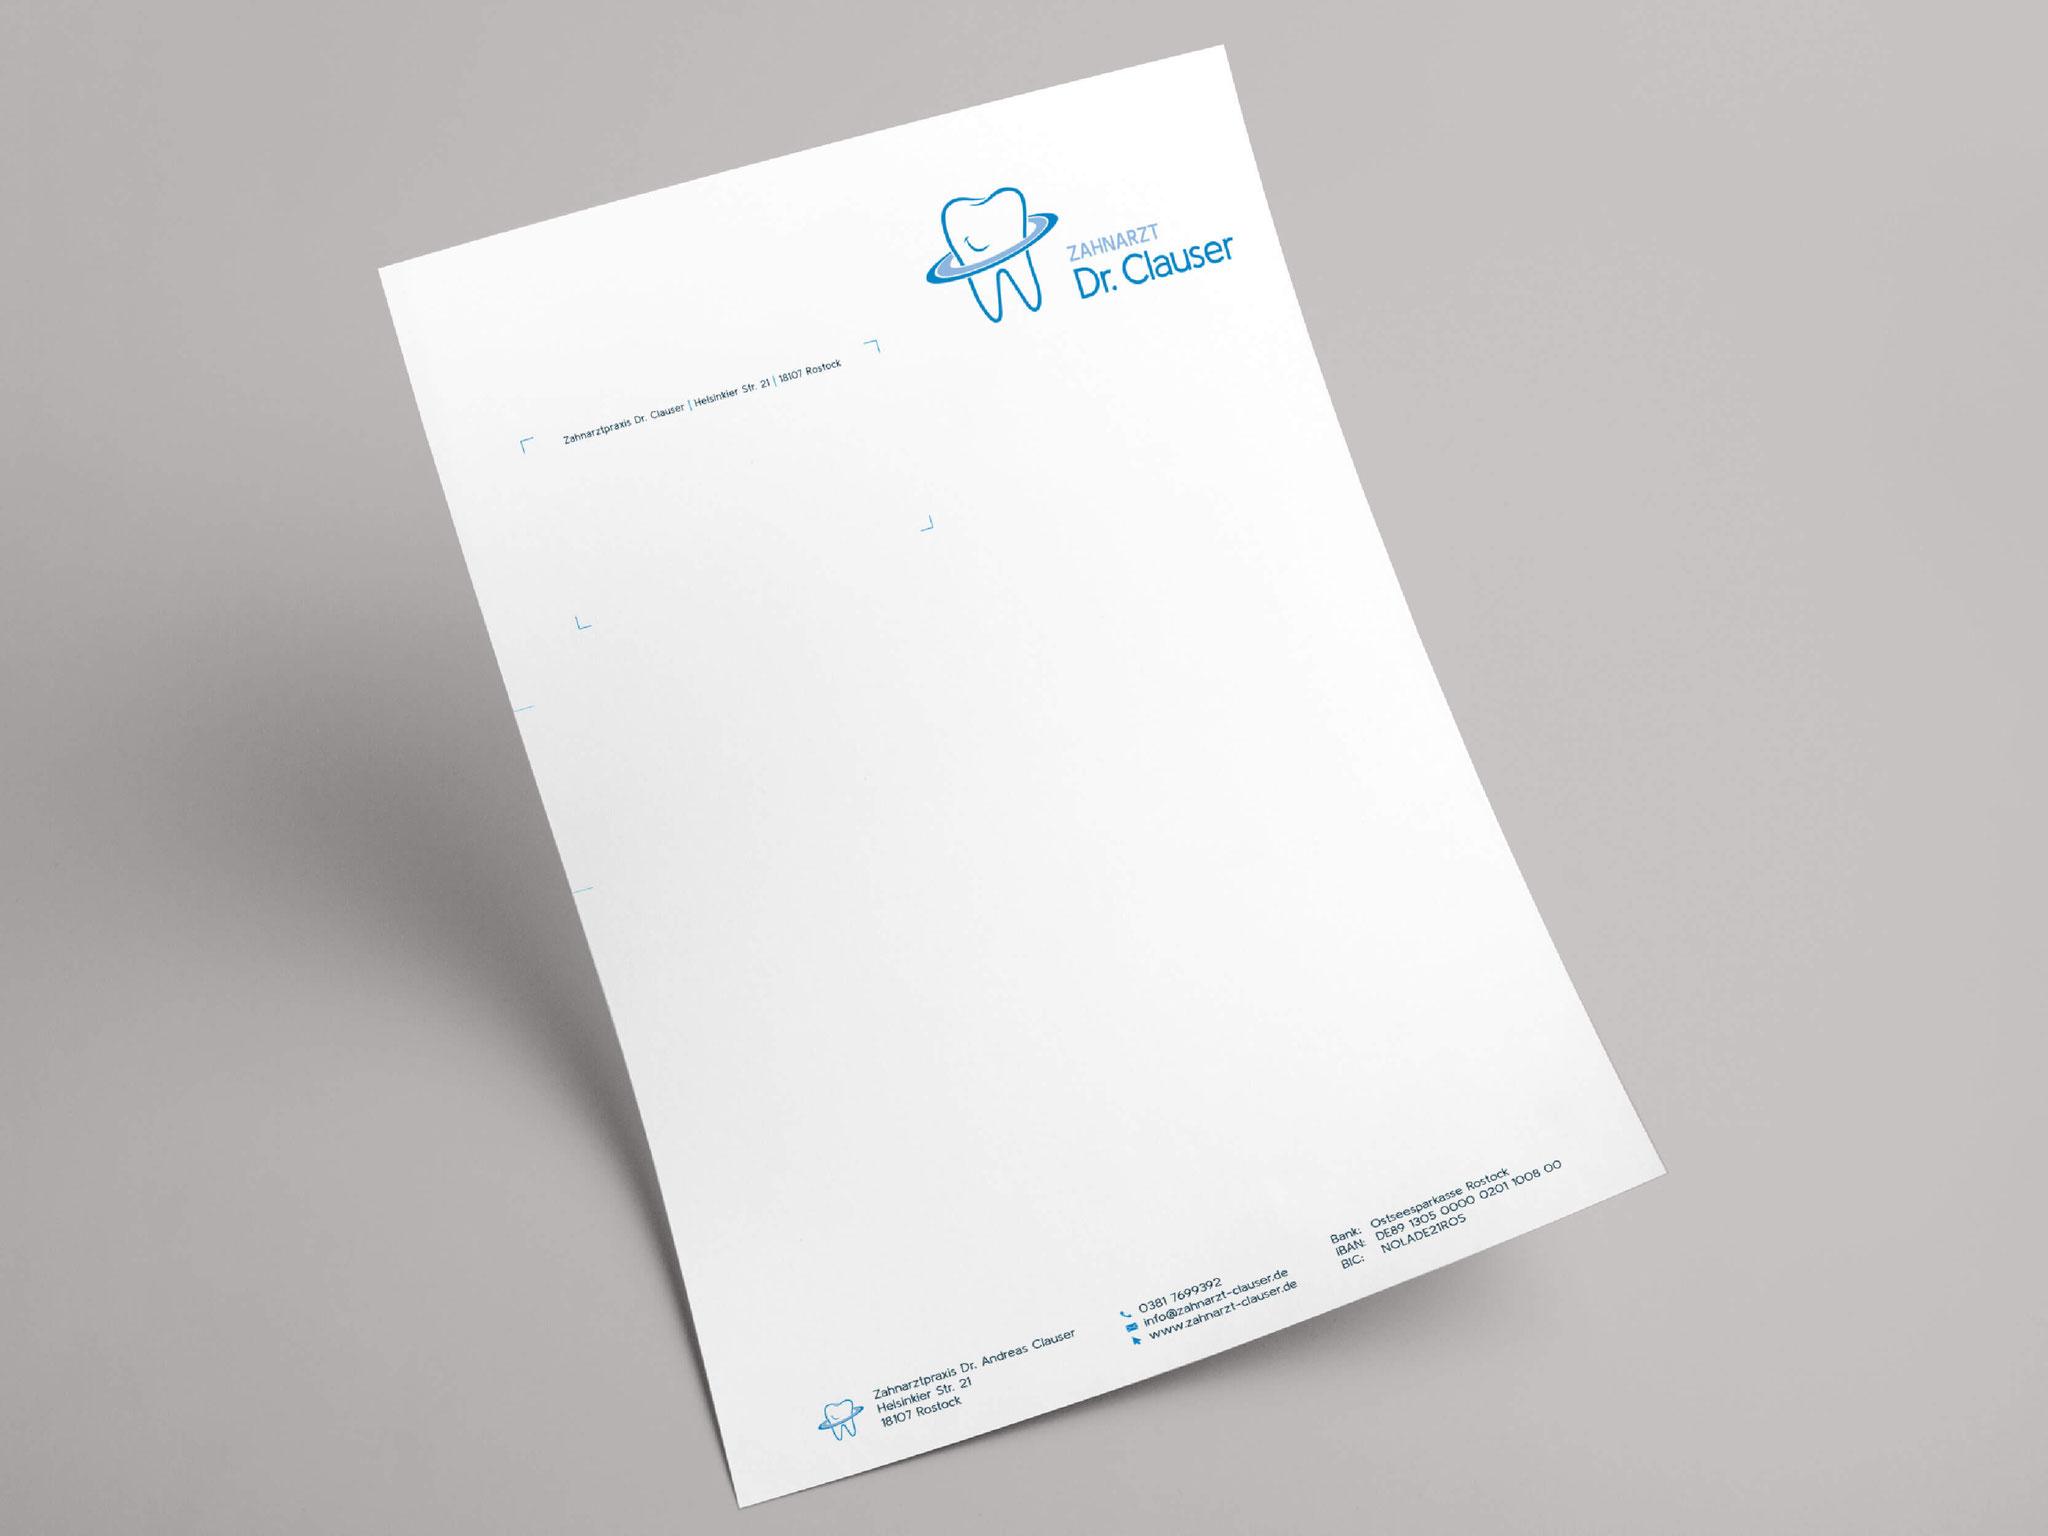 Zahnarzt Dr. Clauser - Briefpapier